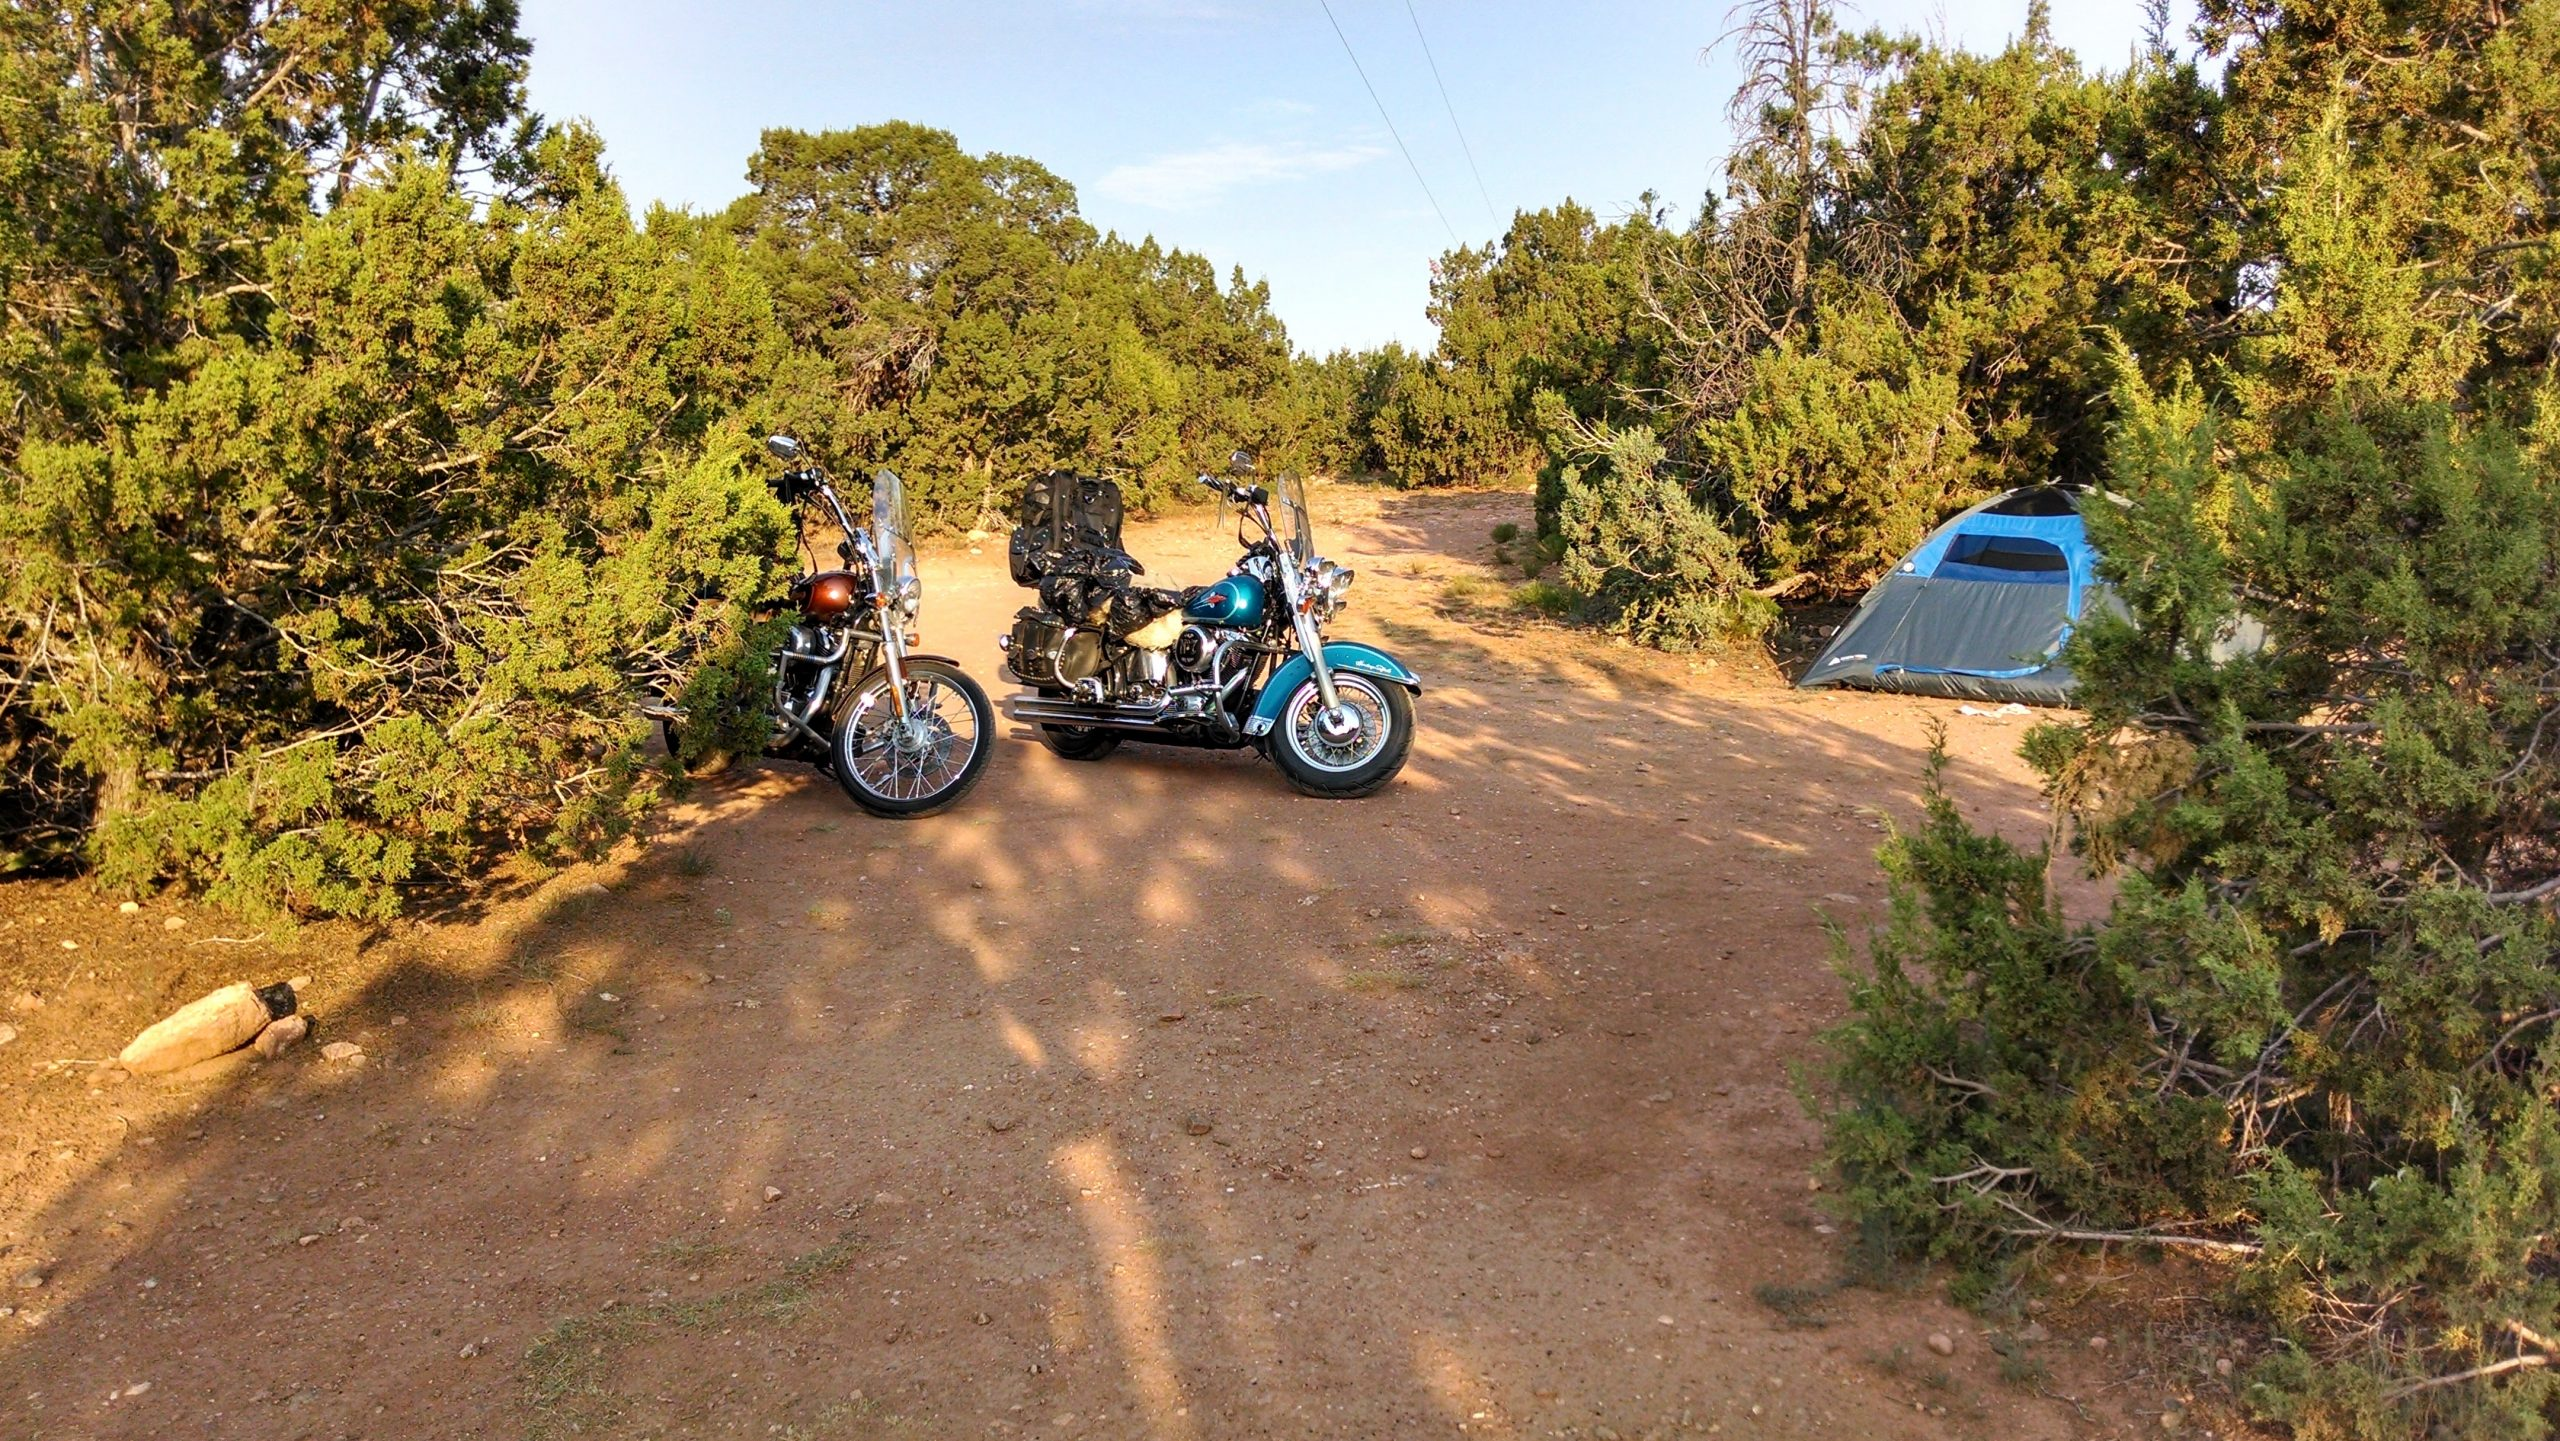 desert campground in colorado